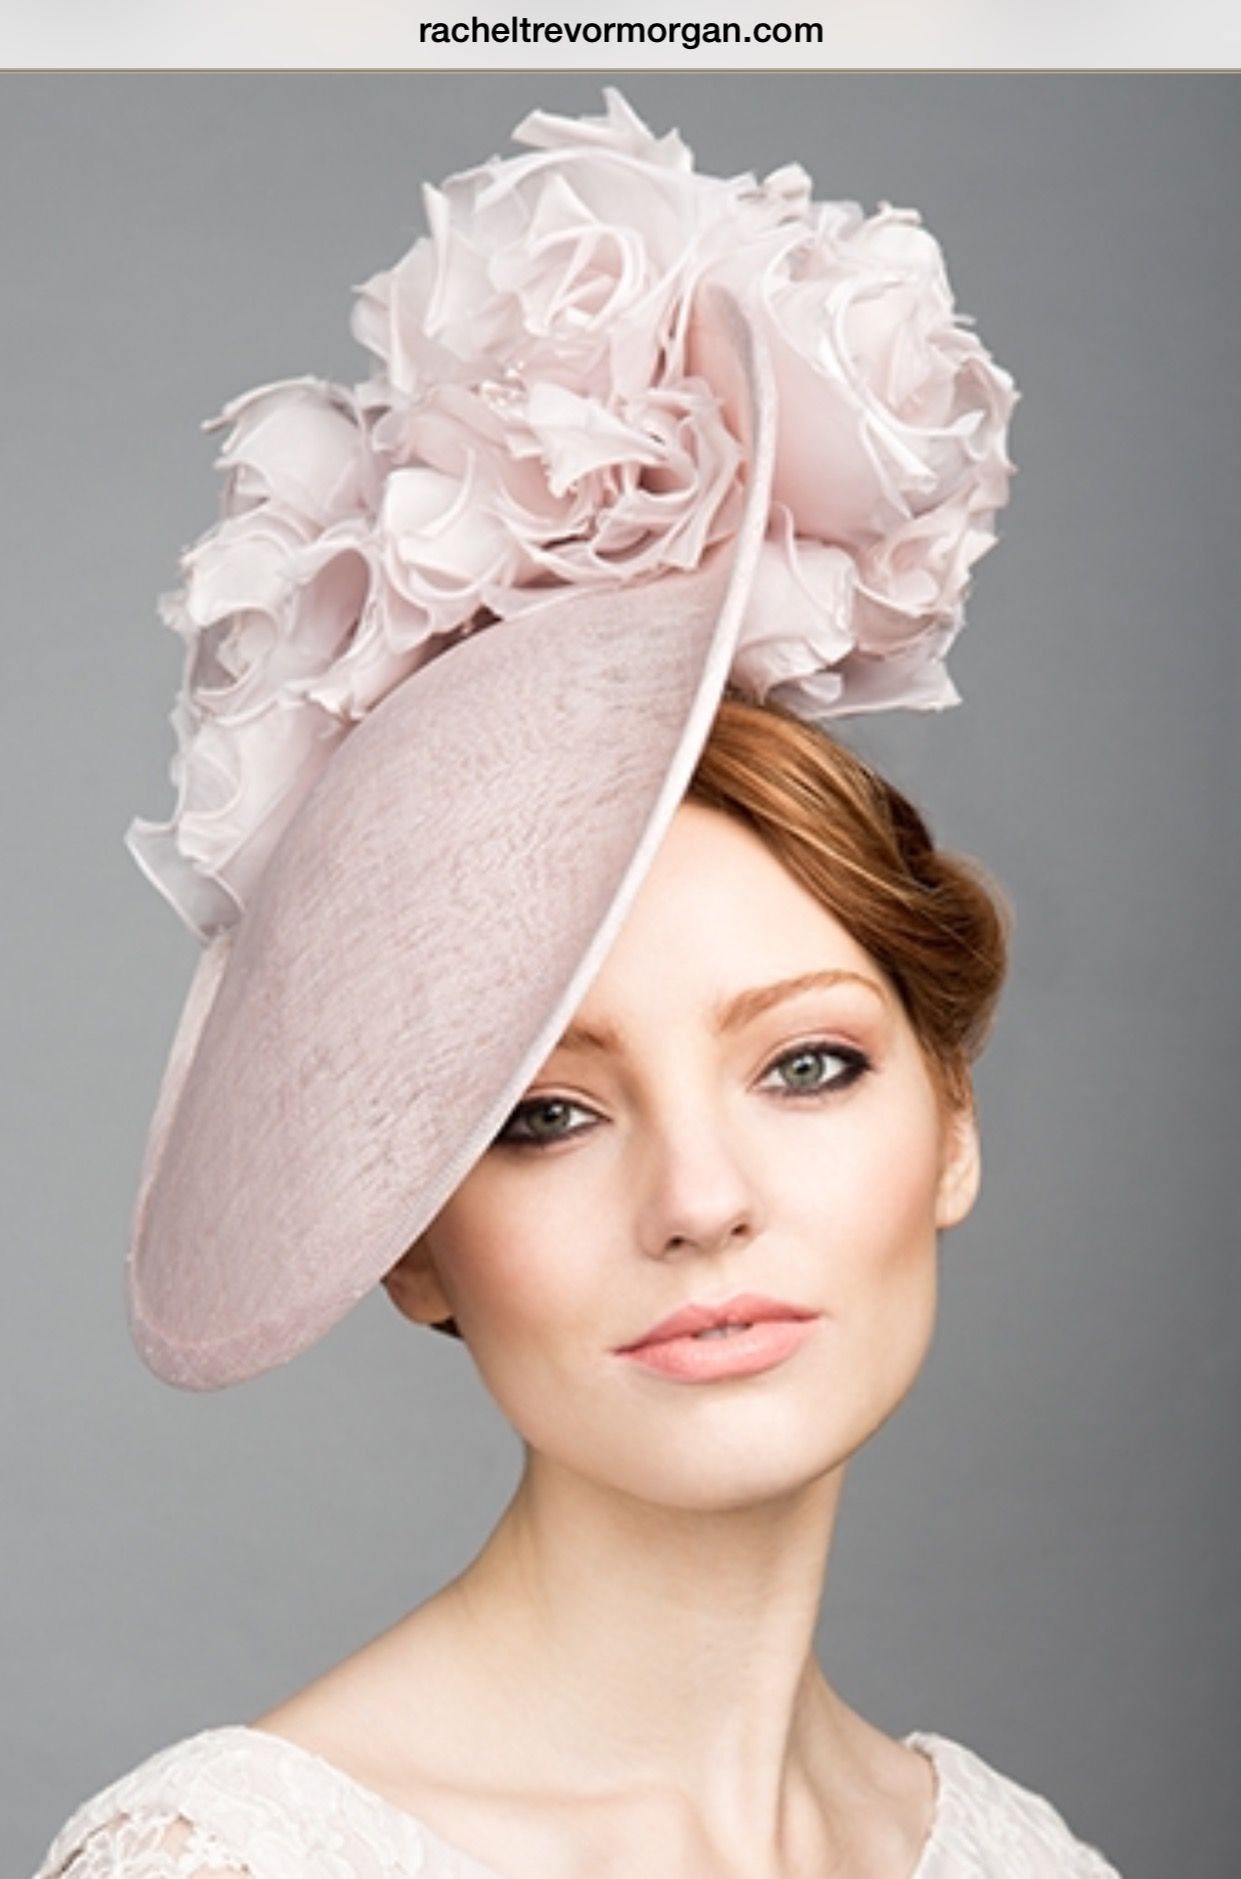 acf3b34ac592c Pink Oversized Flower Hat...Nice